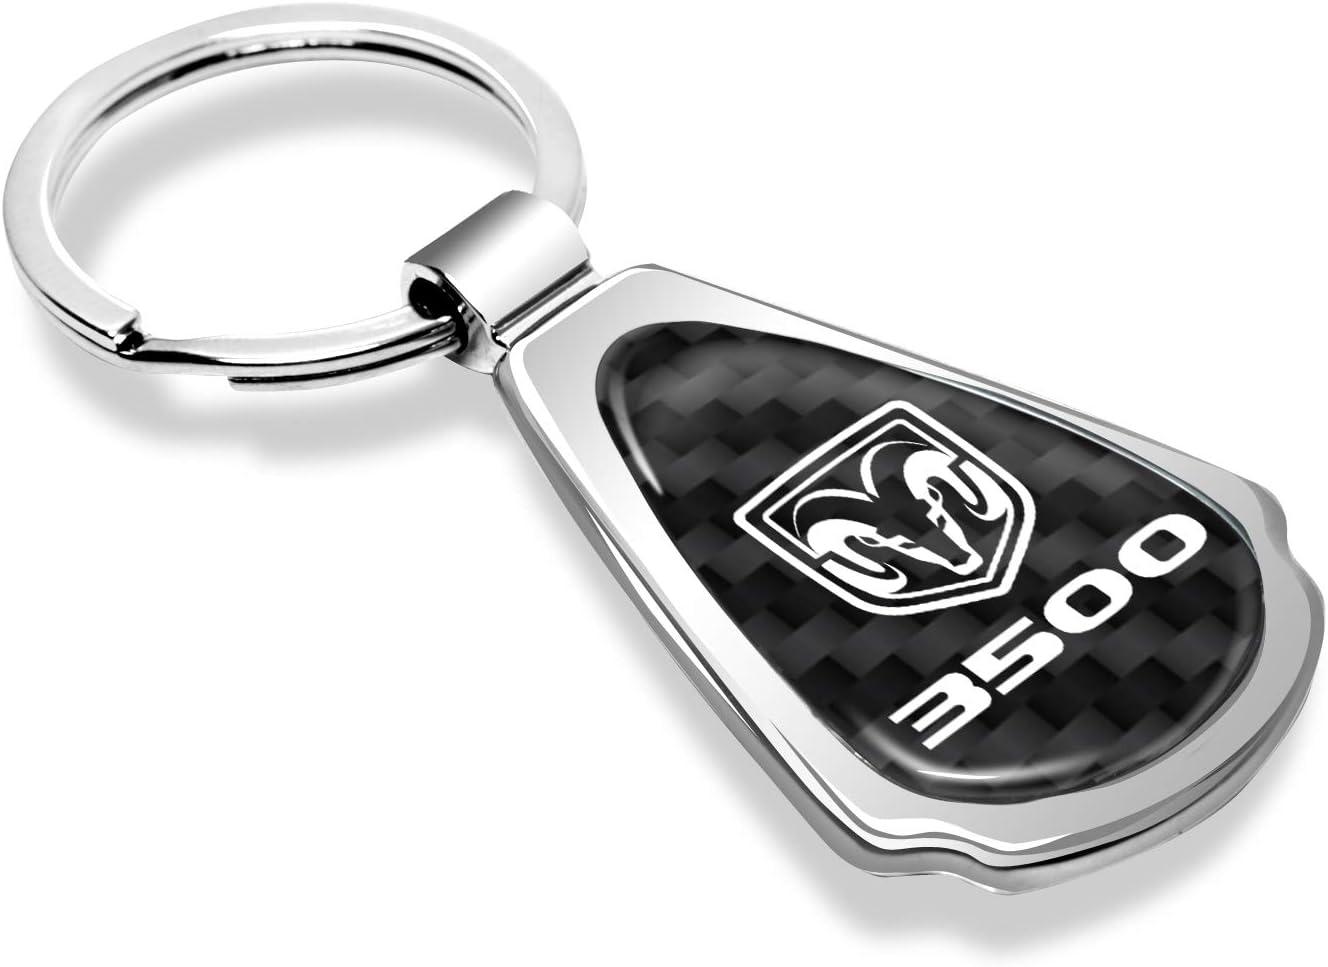 iPick Image for RAM 3500 Logo Real Black Carbon Fiber Chrome Metal Teardrop Key Chain